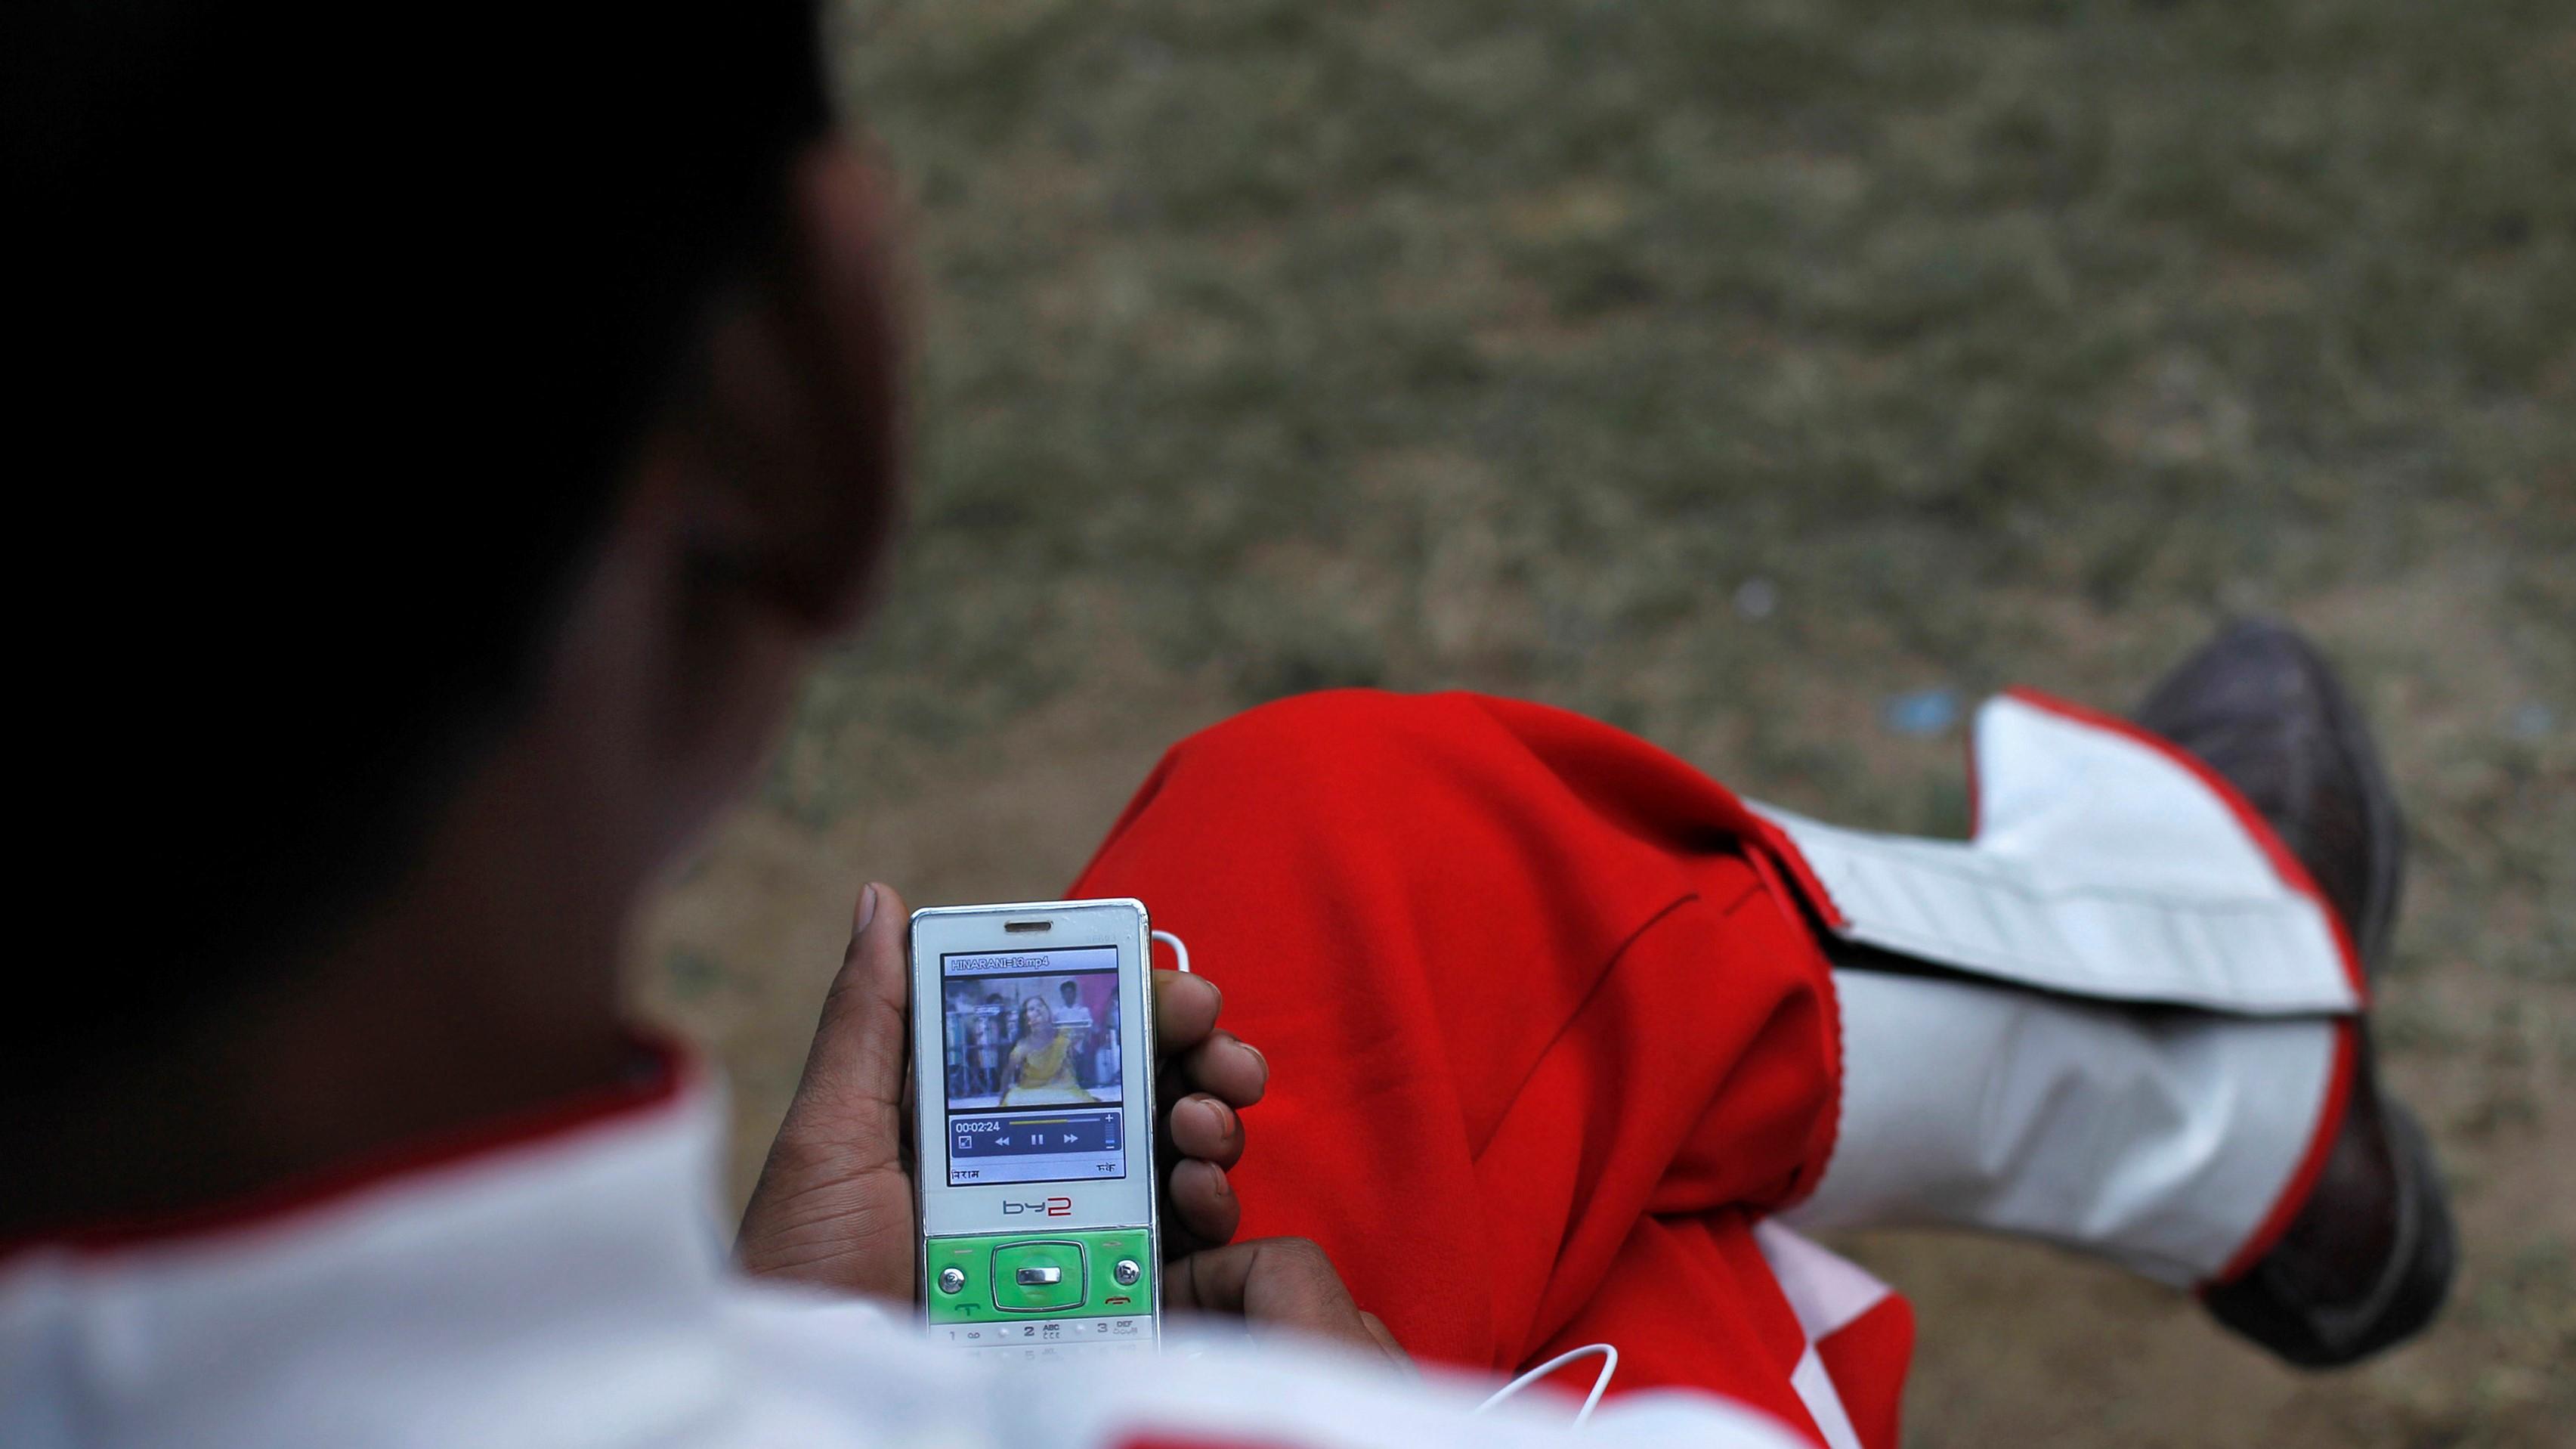 Cheap 4G data plans, smartphones fuelling India's data boom: Trai